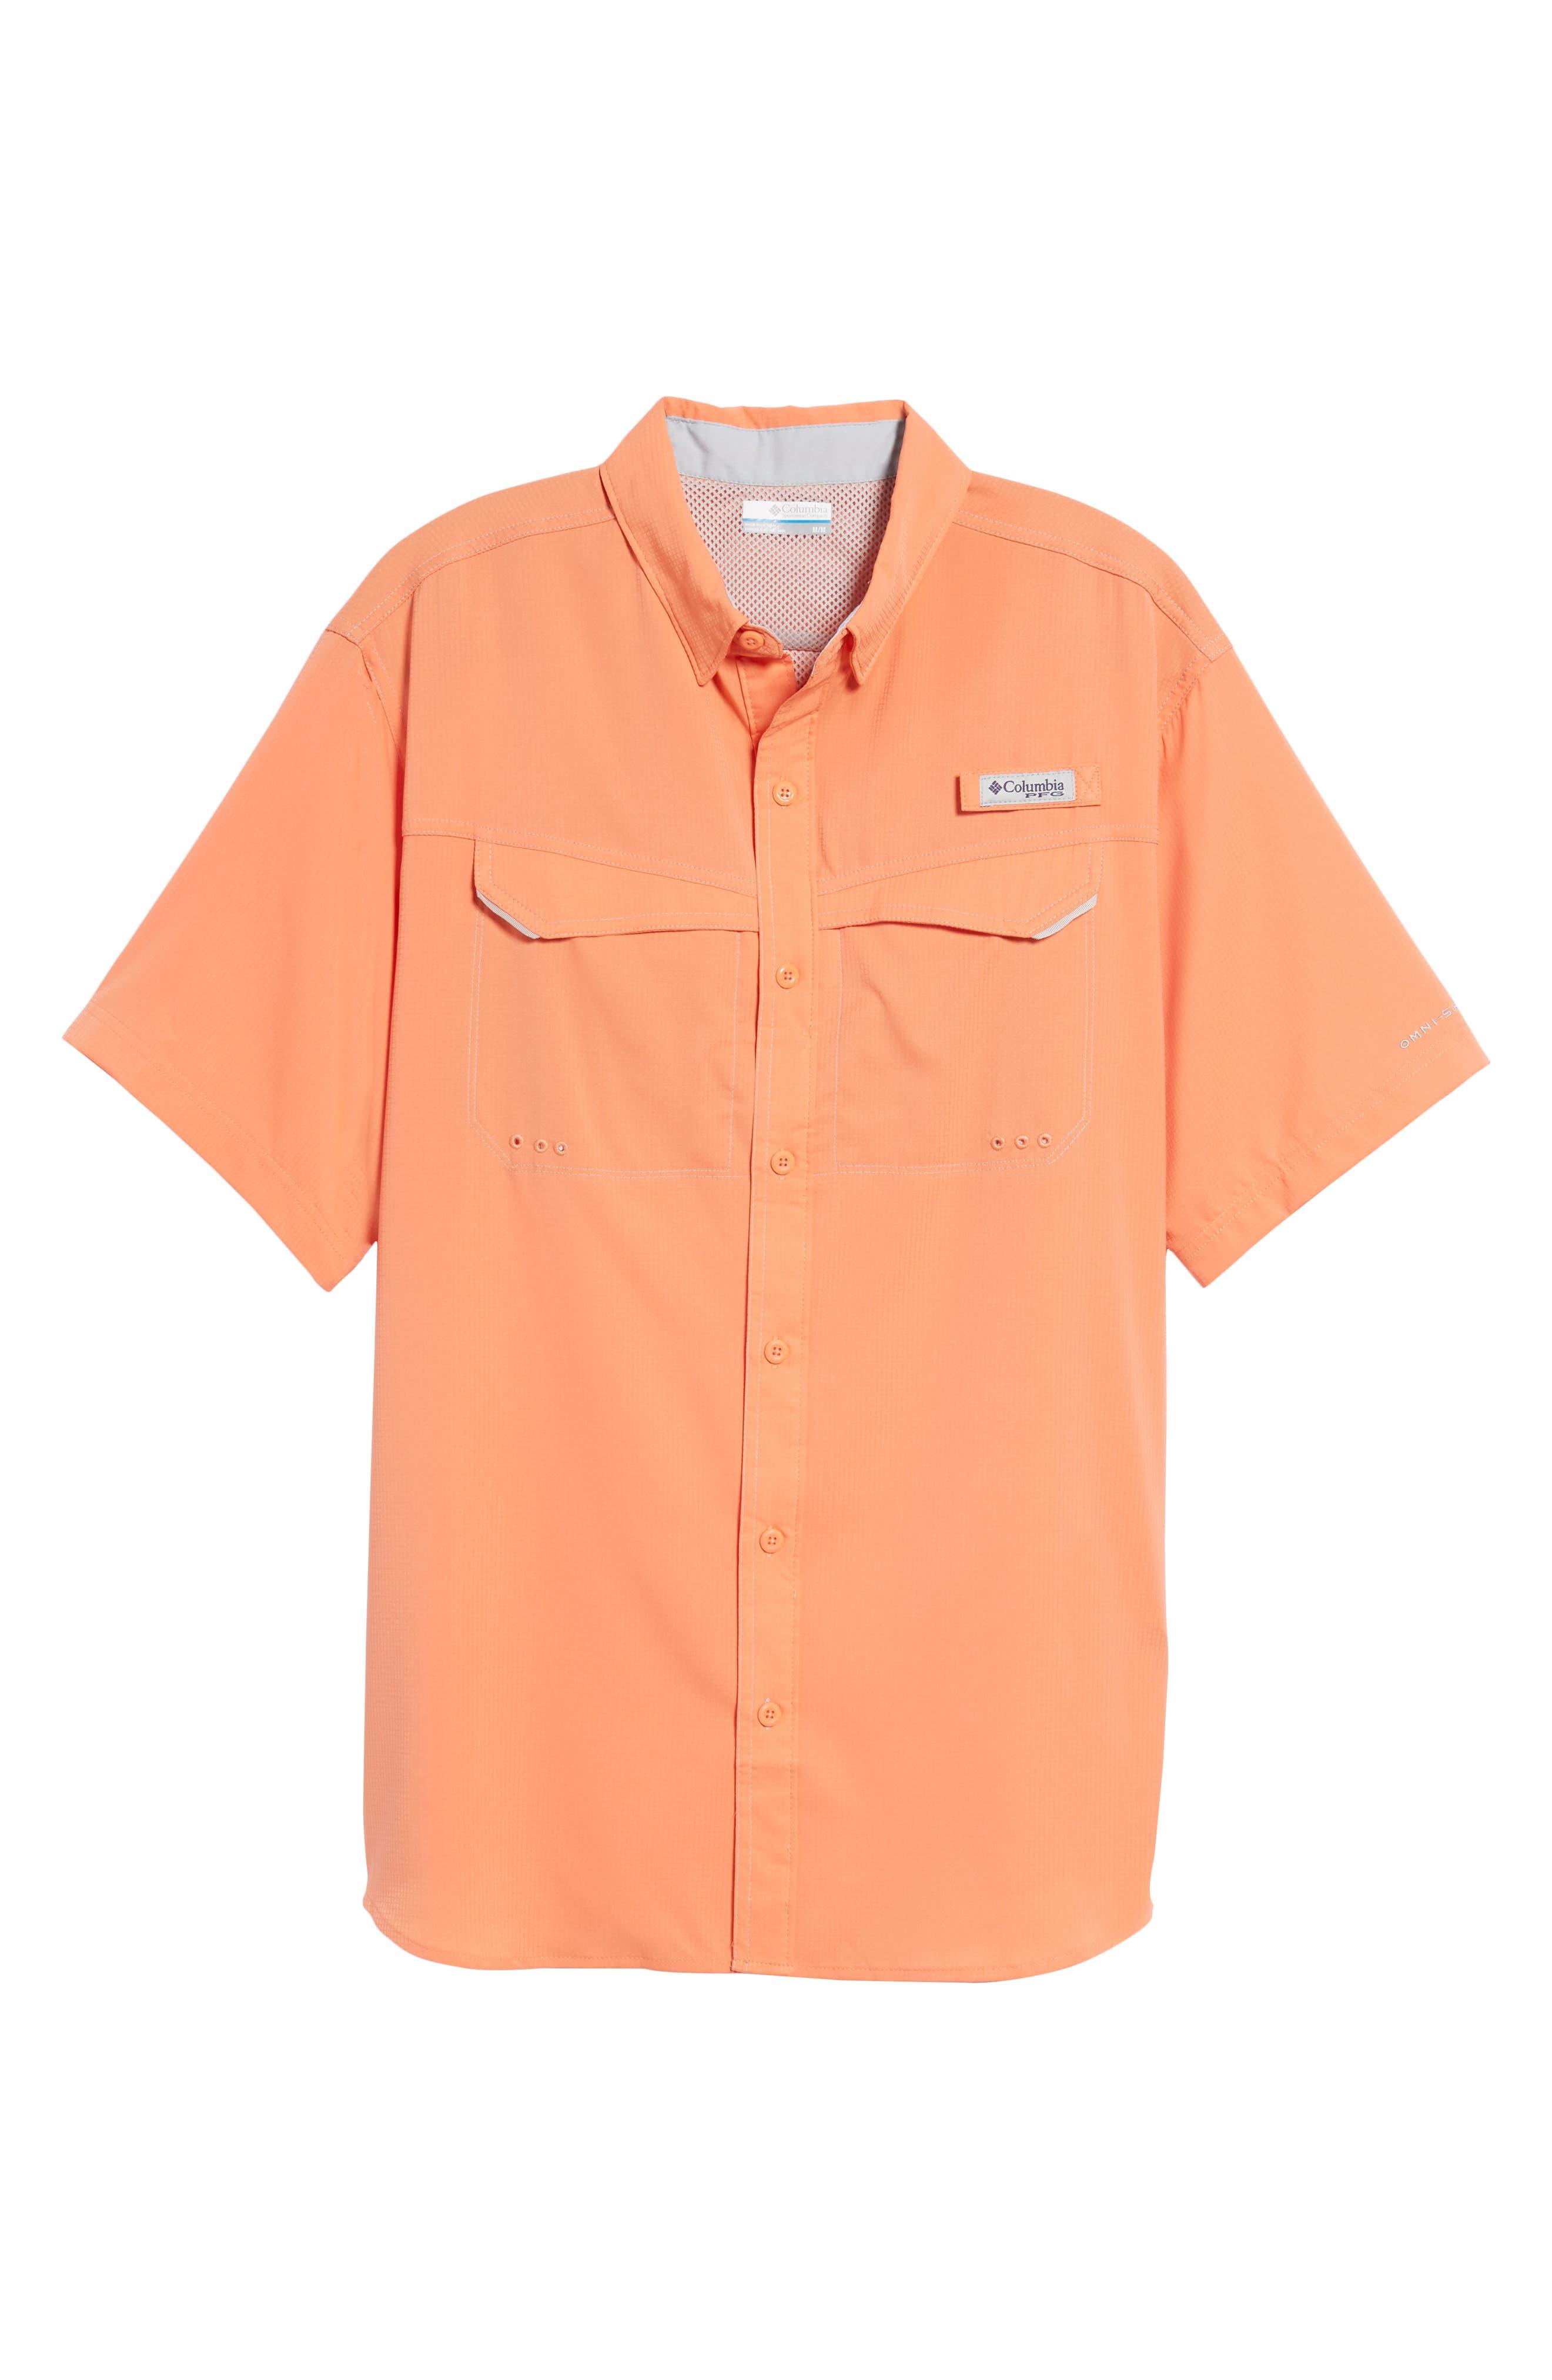 PFG Low Drag Offshore Woven Shirt,                             Alternate thumbnail 30, color,